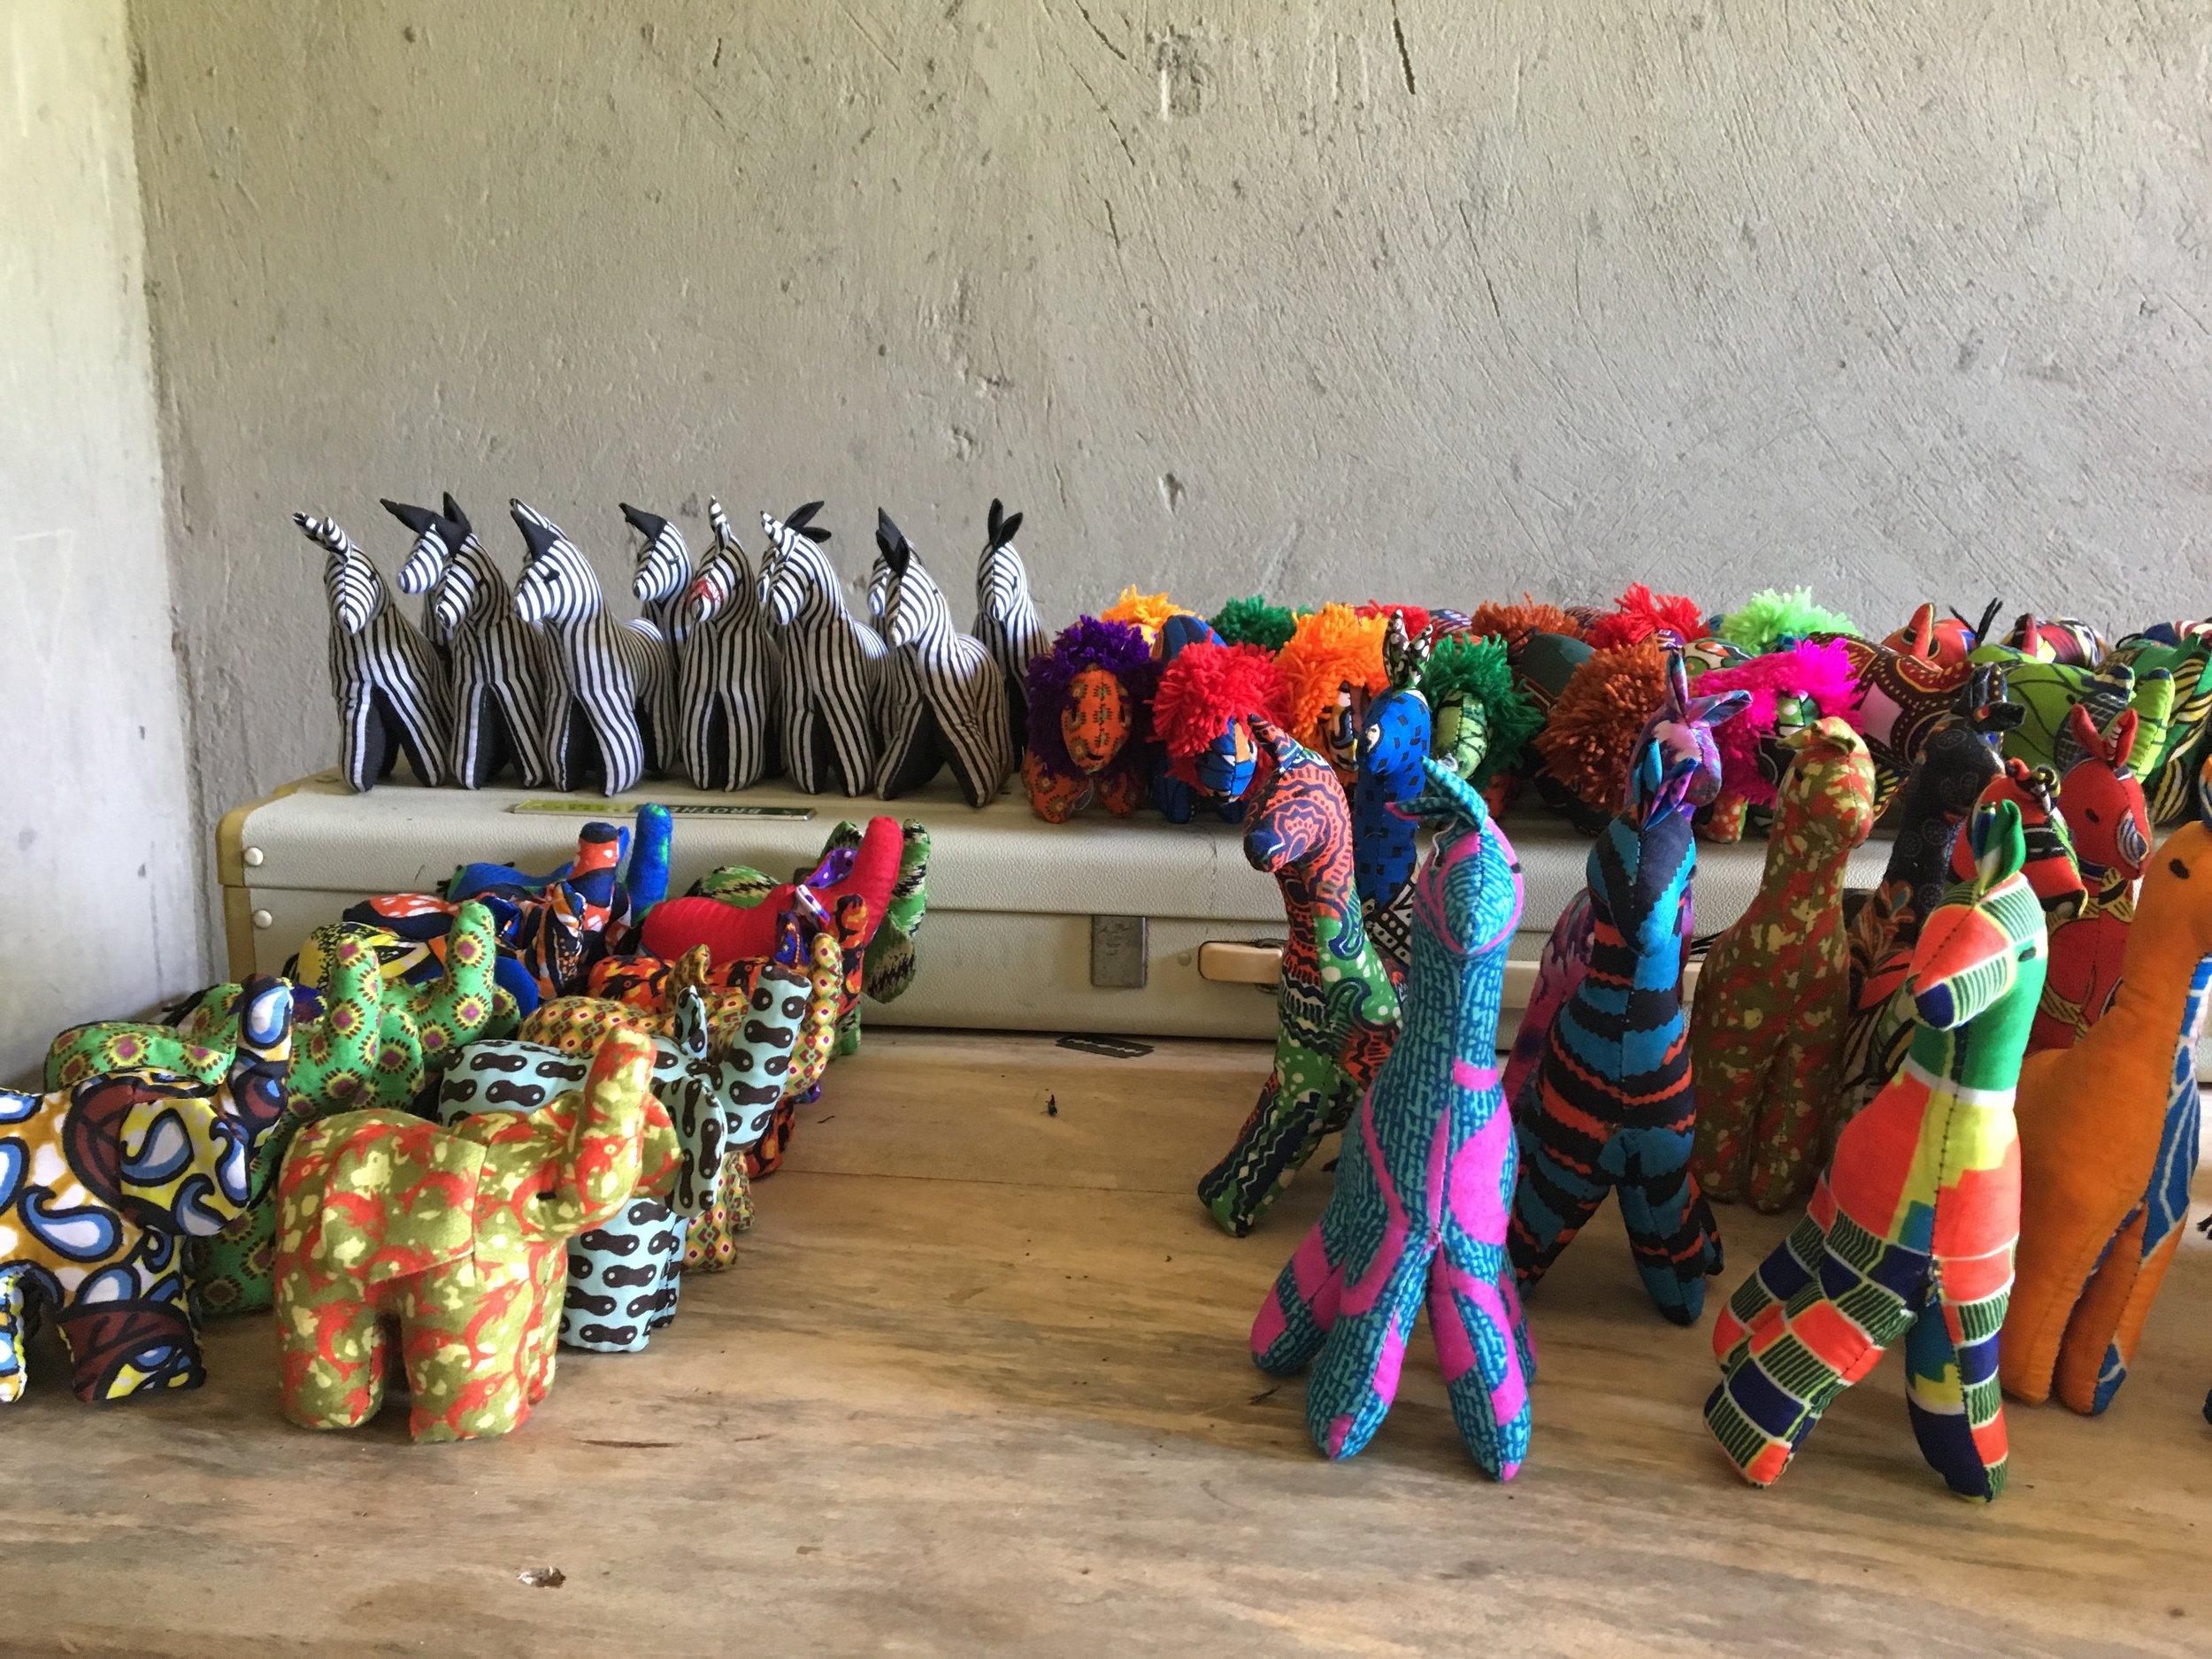 Unique Animal Toys - From Uganda